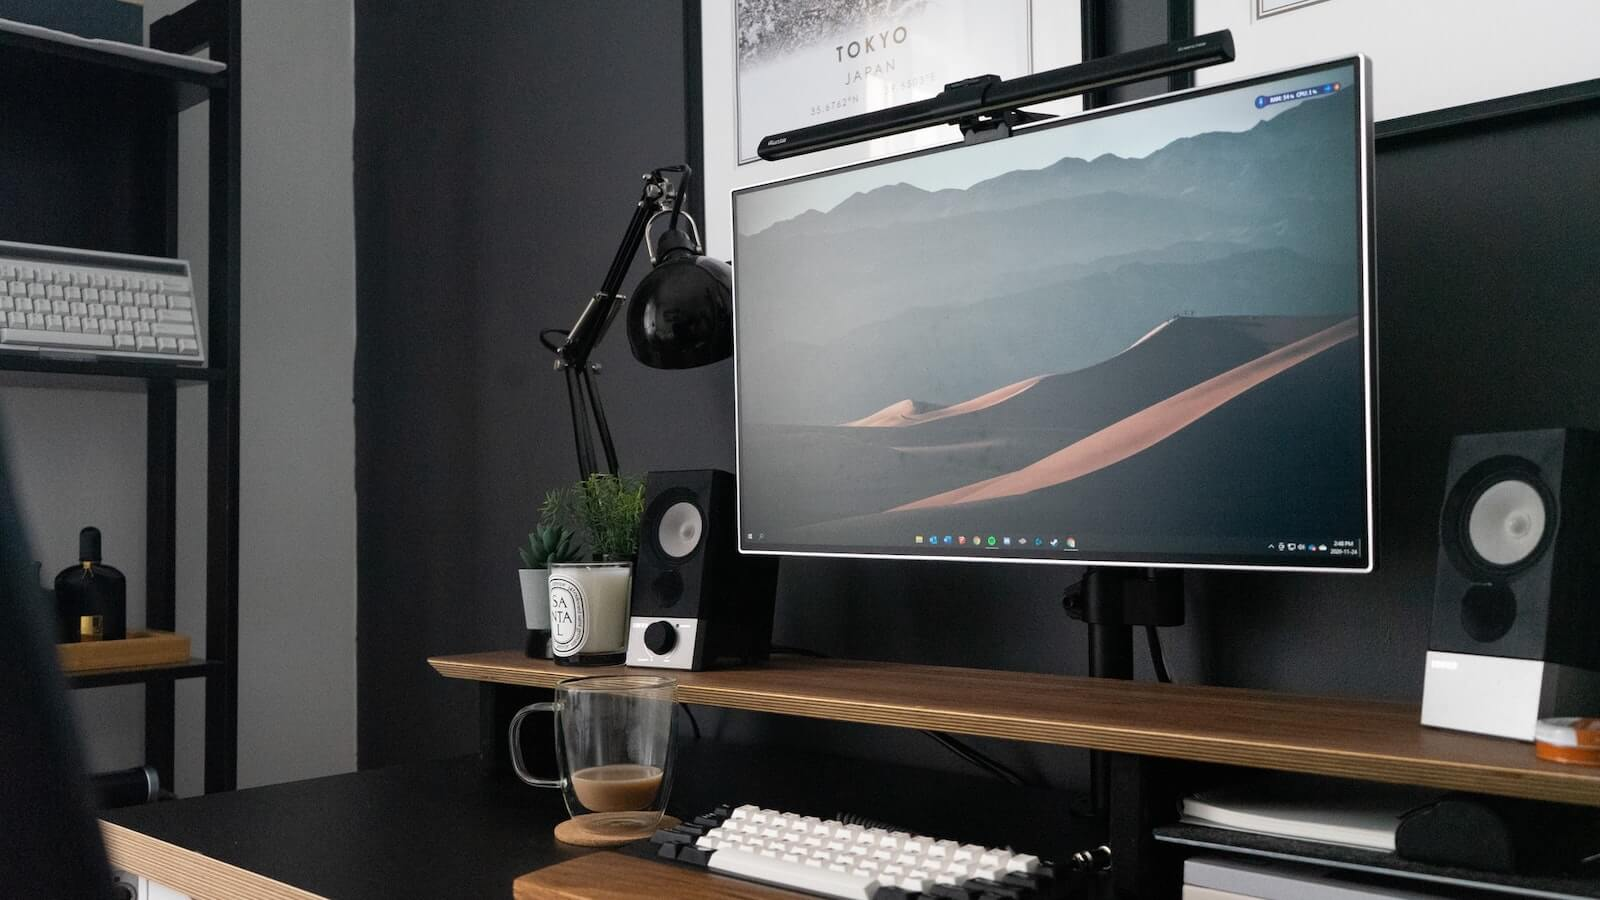 A desk workspace set against a black wall